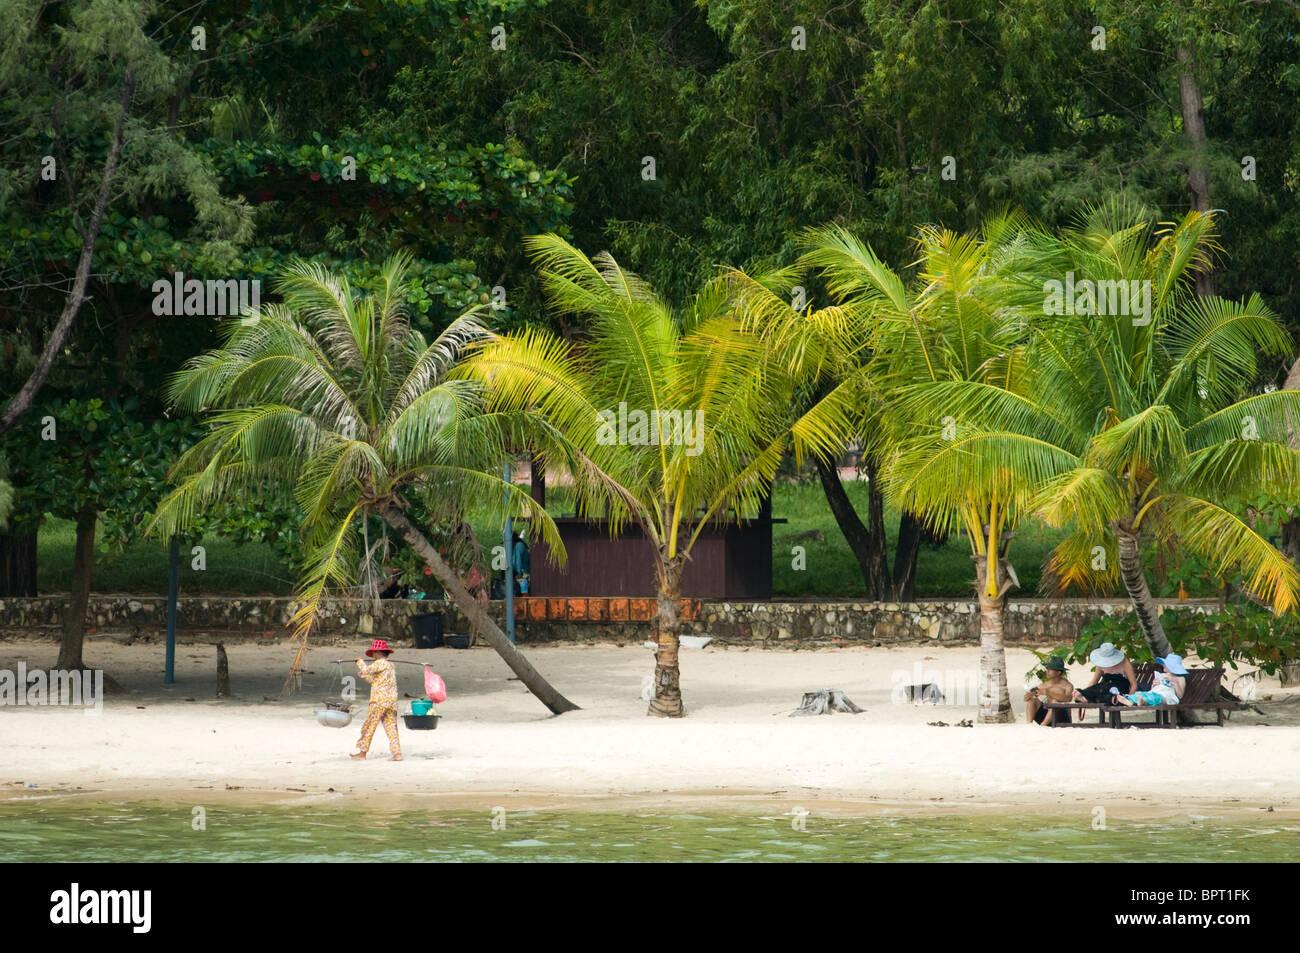 Victory Beach scene, Sihanoukville, Cambodia - Stock Image